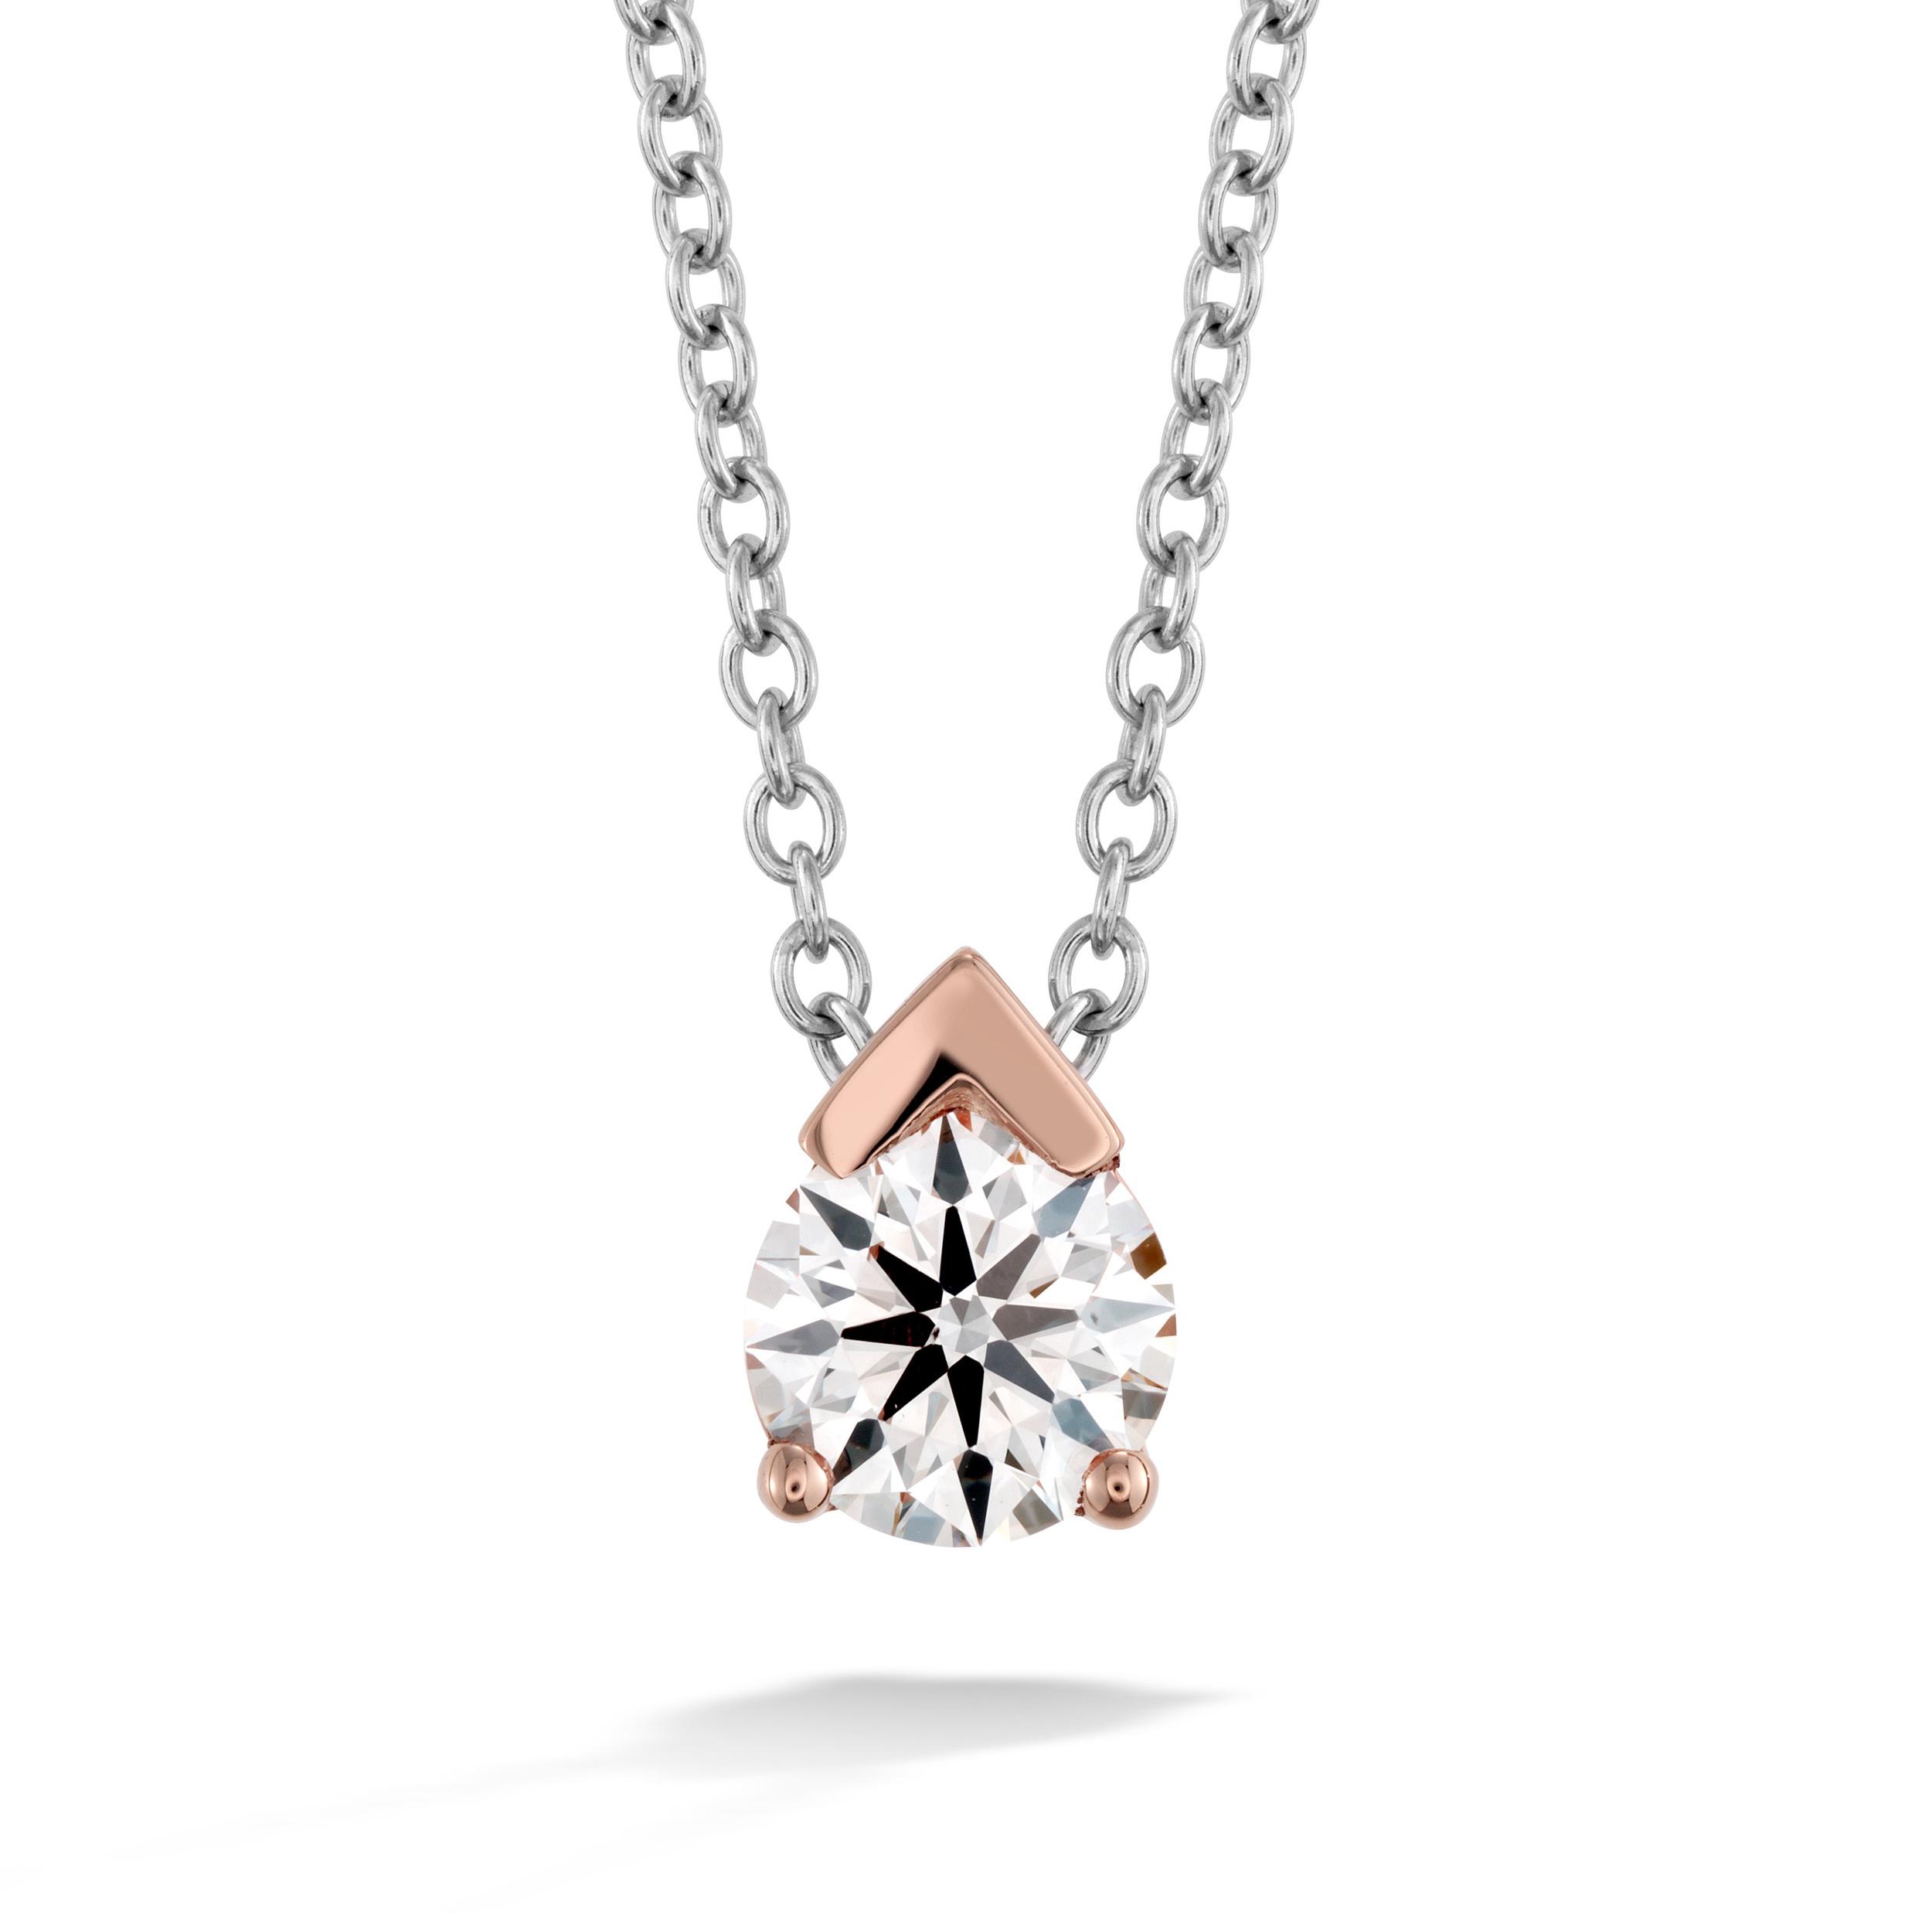 Diamond   Camarillo Jewelers   Van Gundys